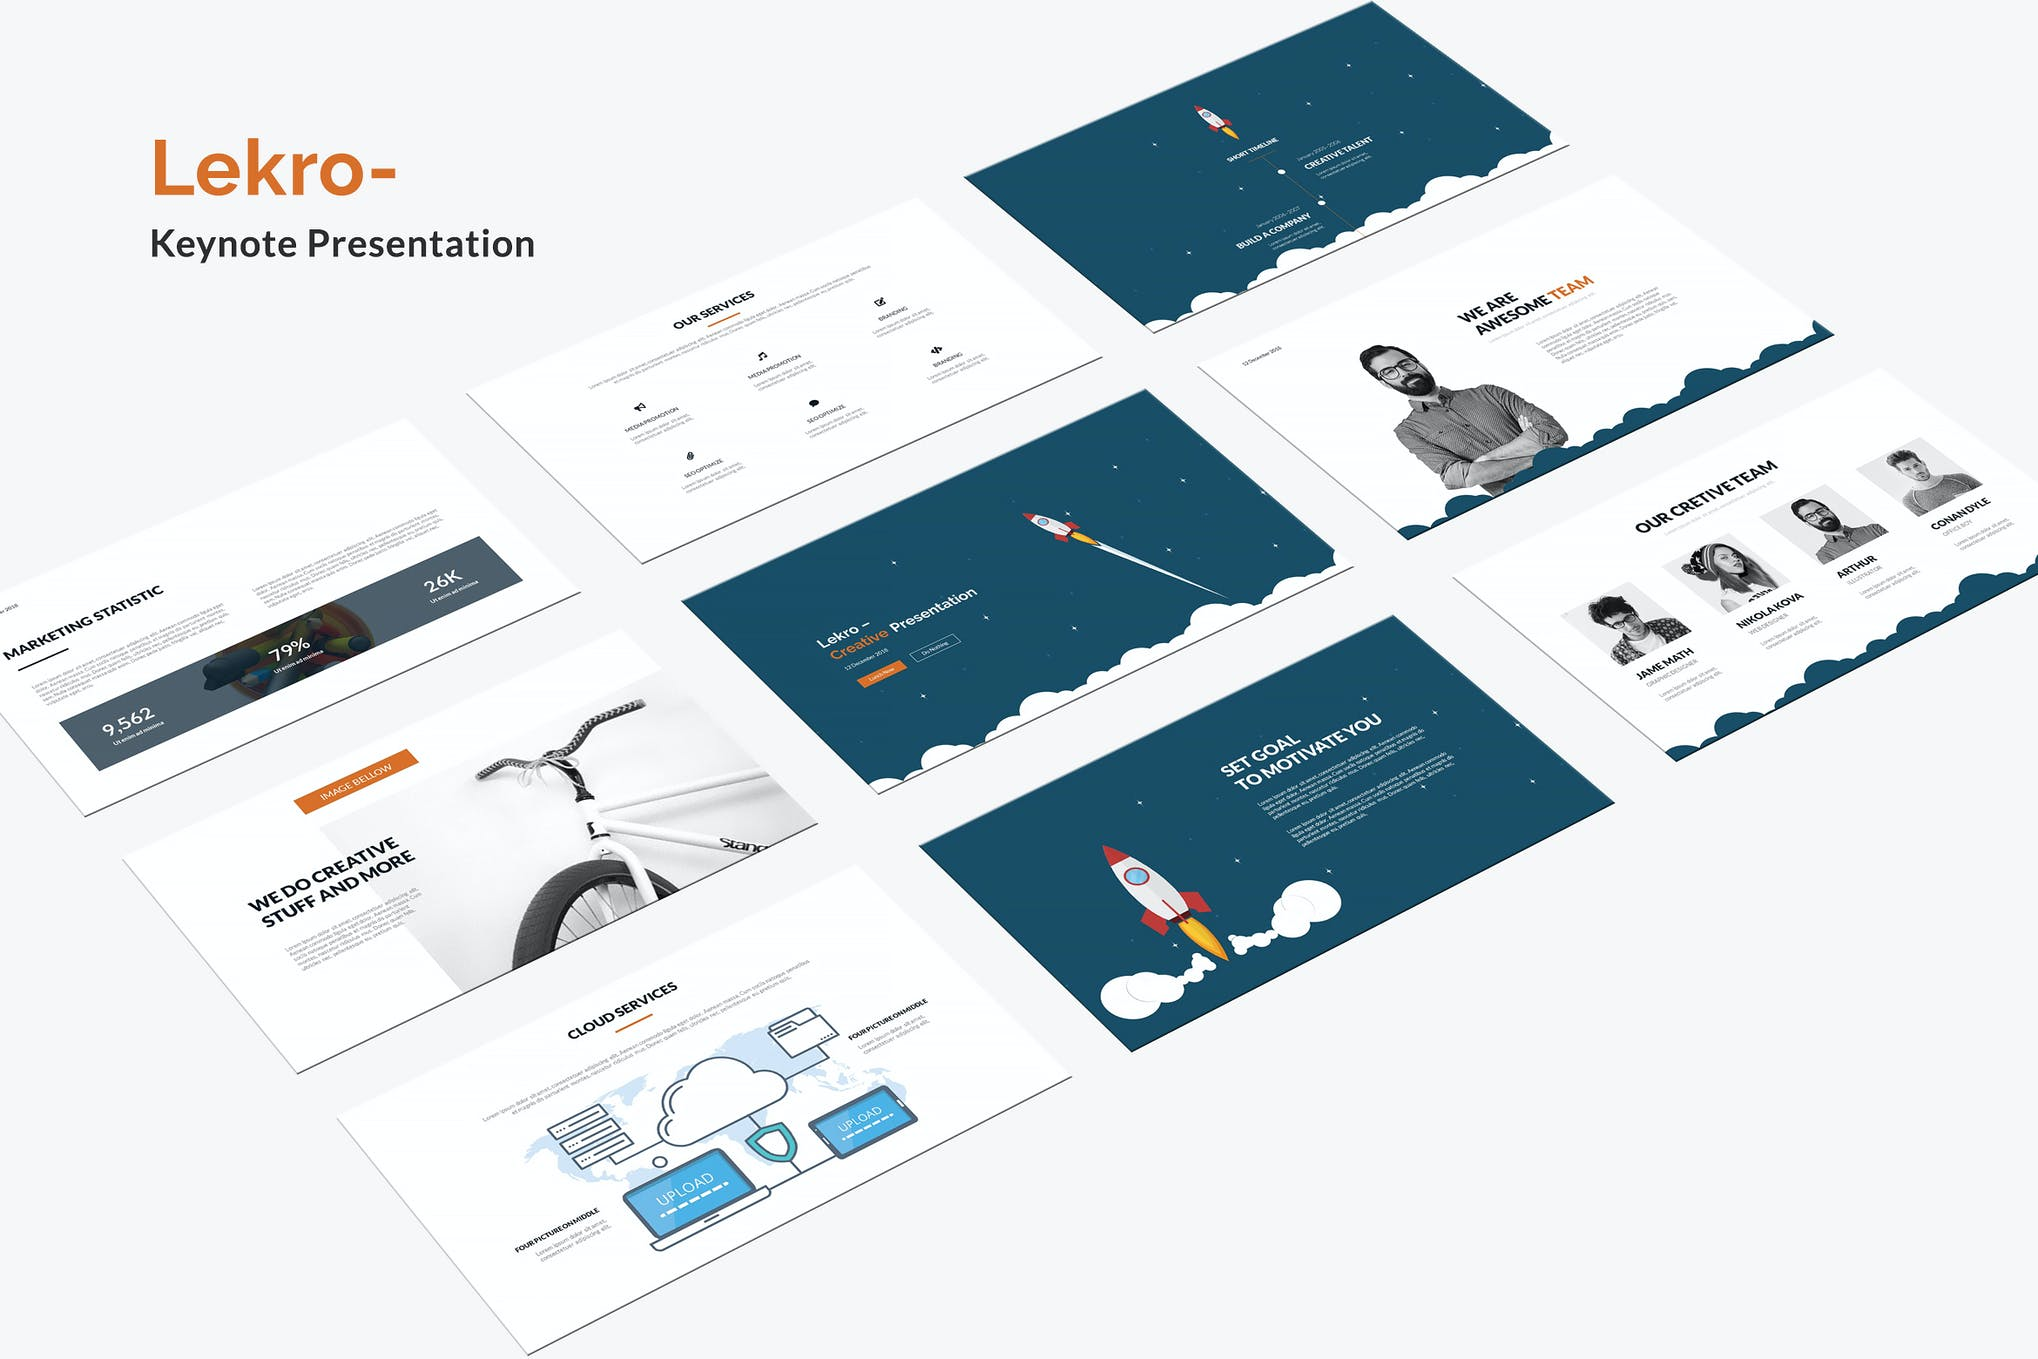 Lekro Keynote Presentation